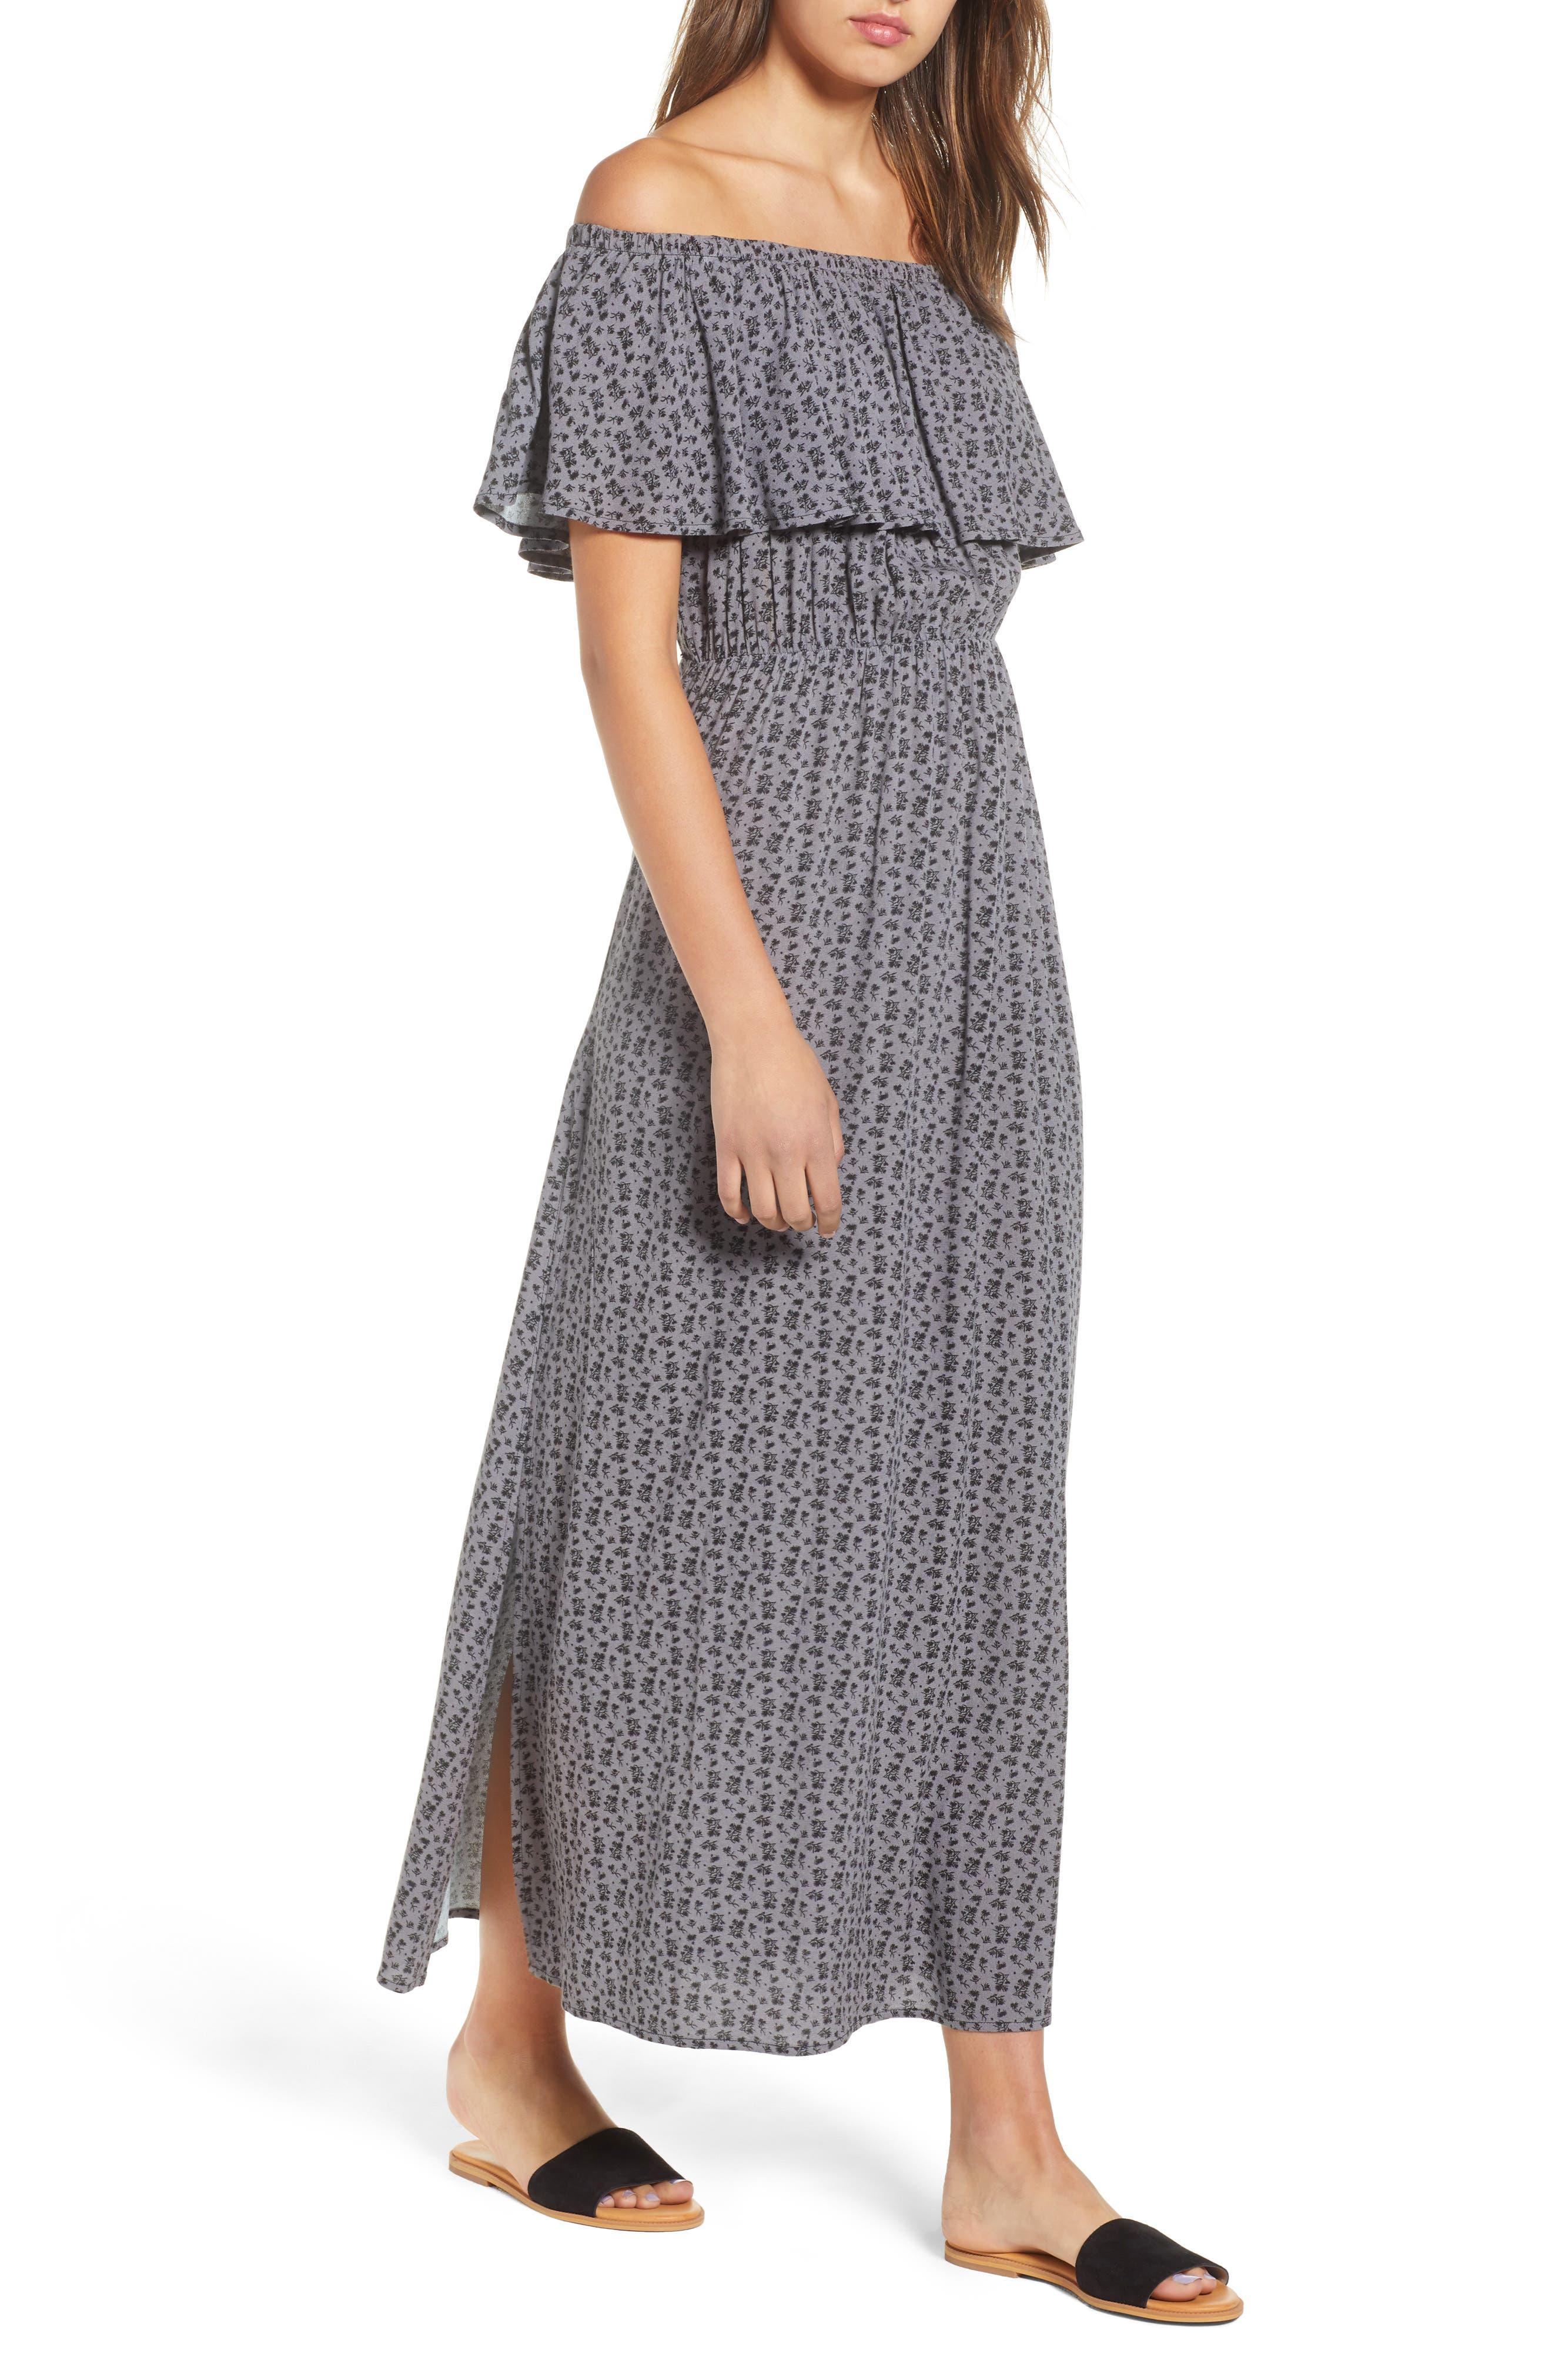 LIRA CLOTHING Marissa Floral Print Off the Shoulder Dress, Main, color, 250